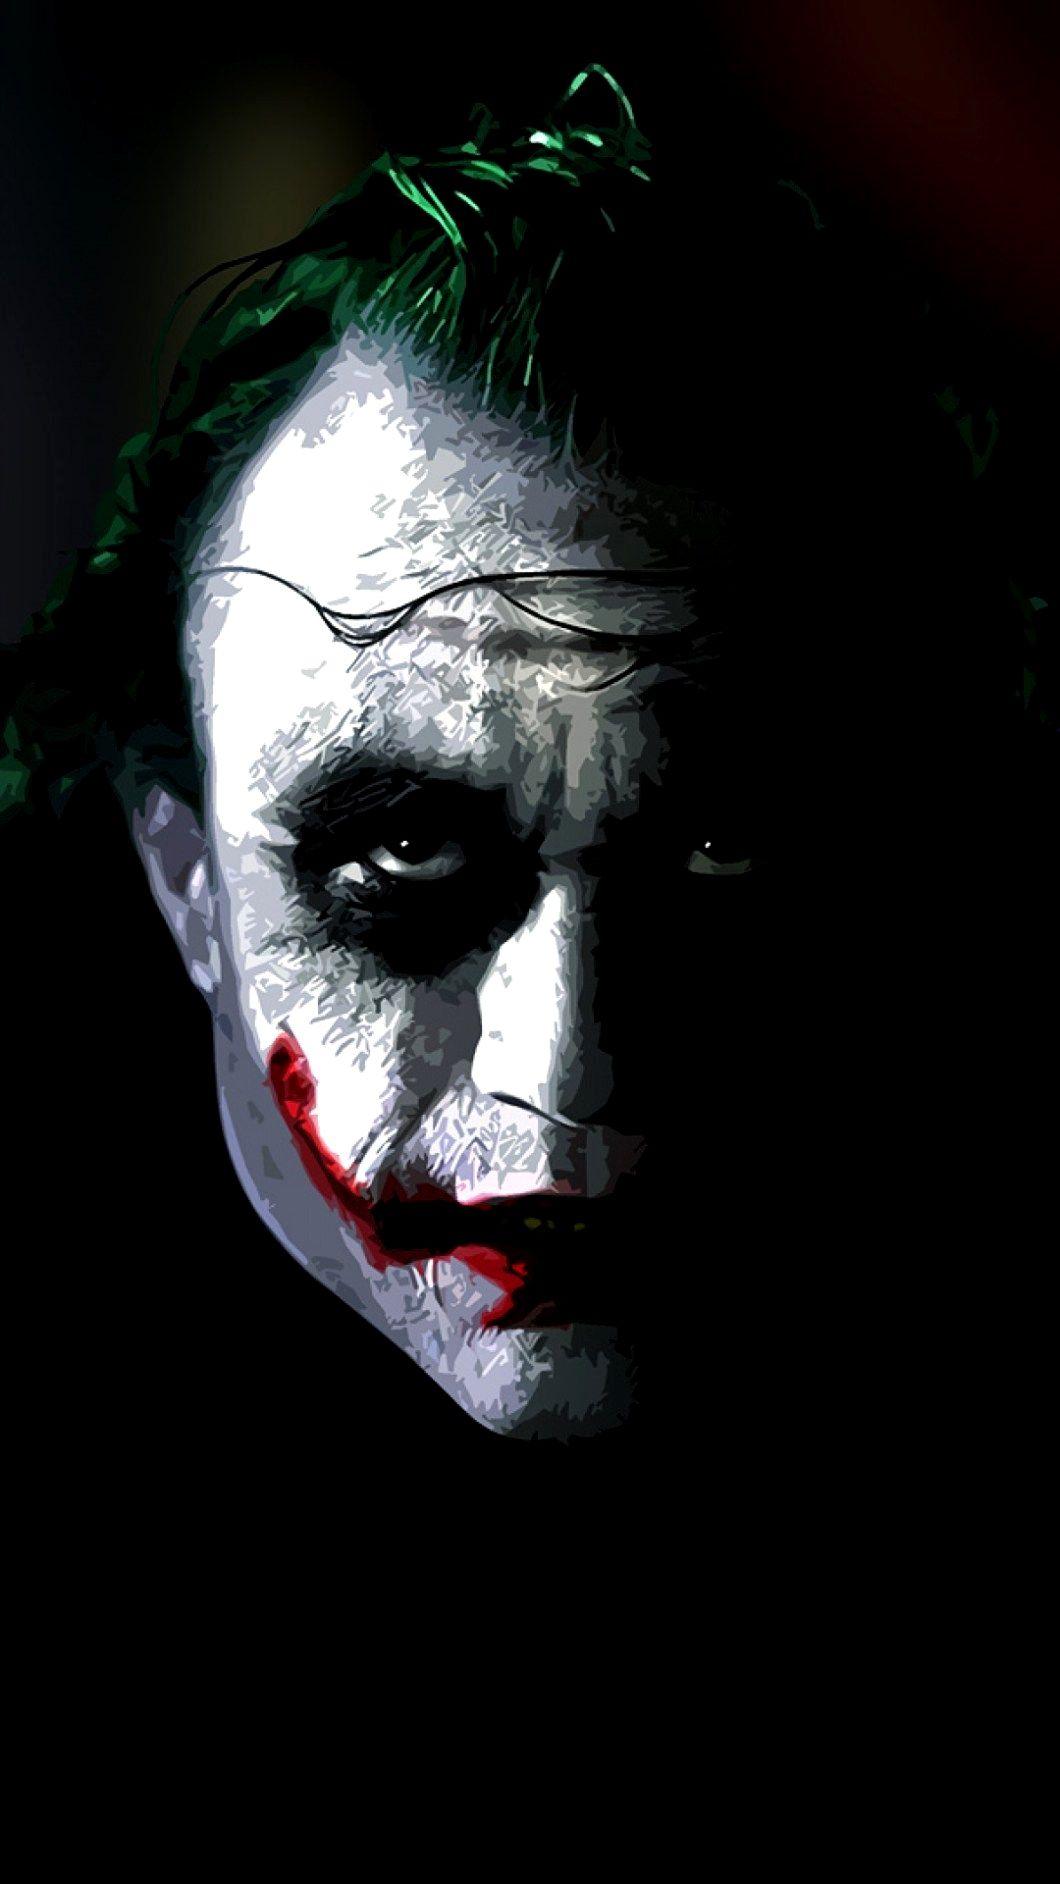 Wallpaper 4k Iphone Joker Gallery In 2020 Joker Wallpapers Joker Pics Joker Images